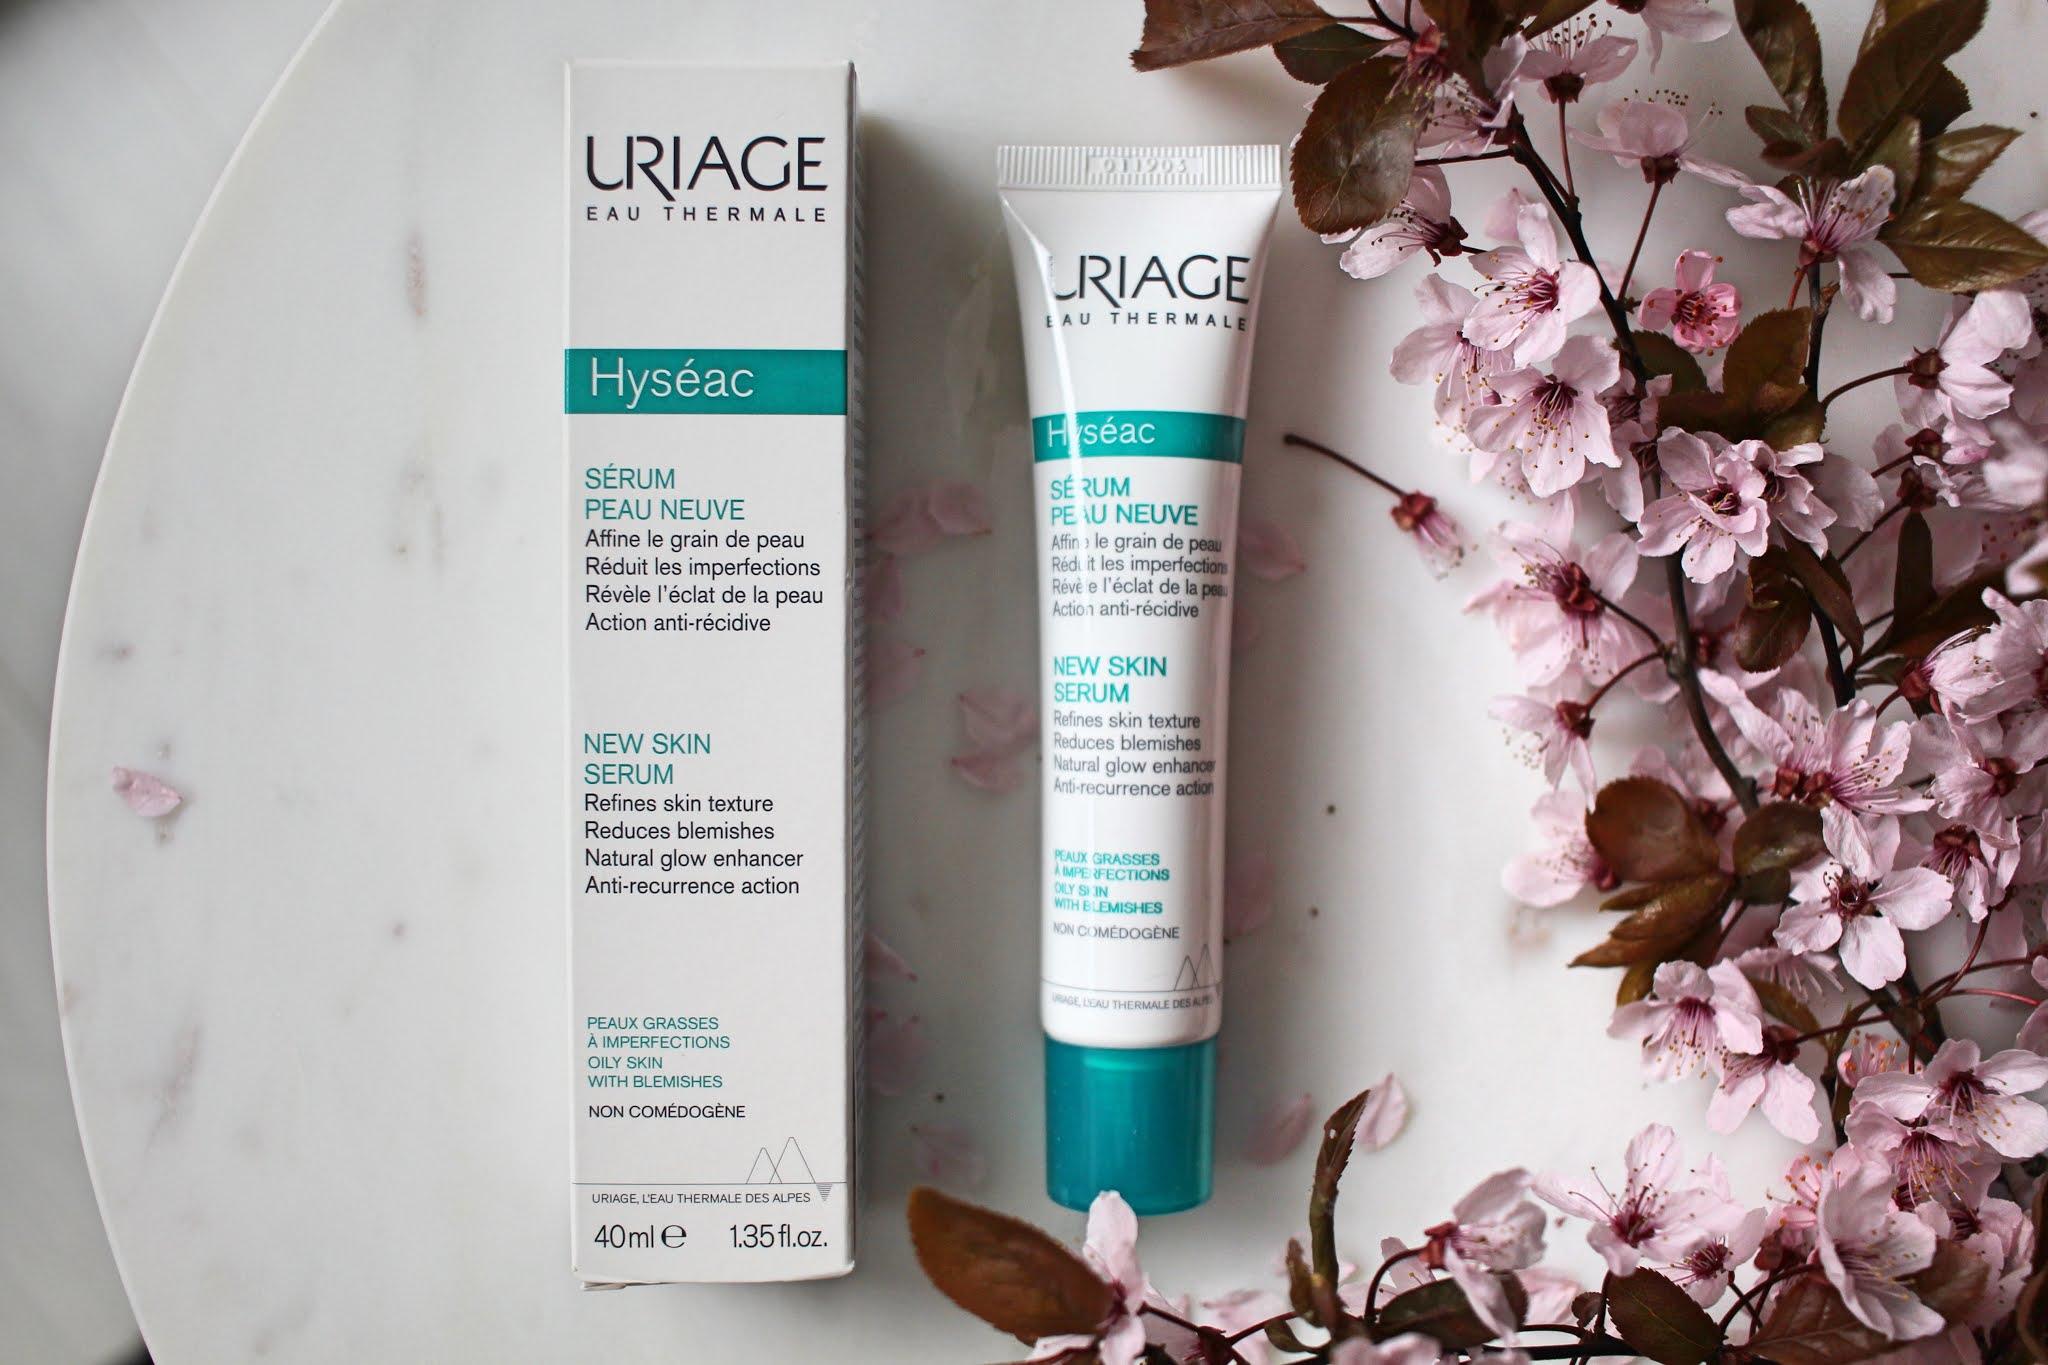 URIAGE - HYSEAC serum